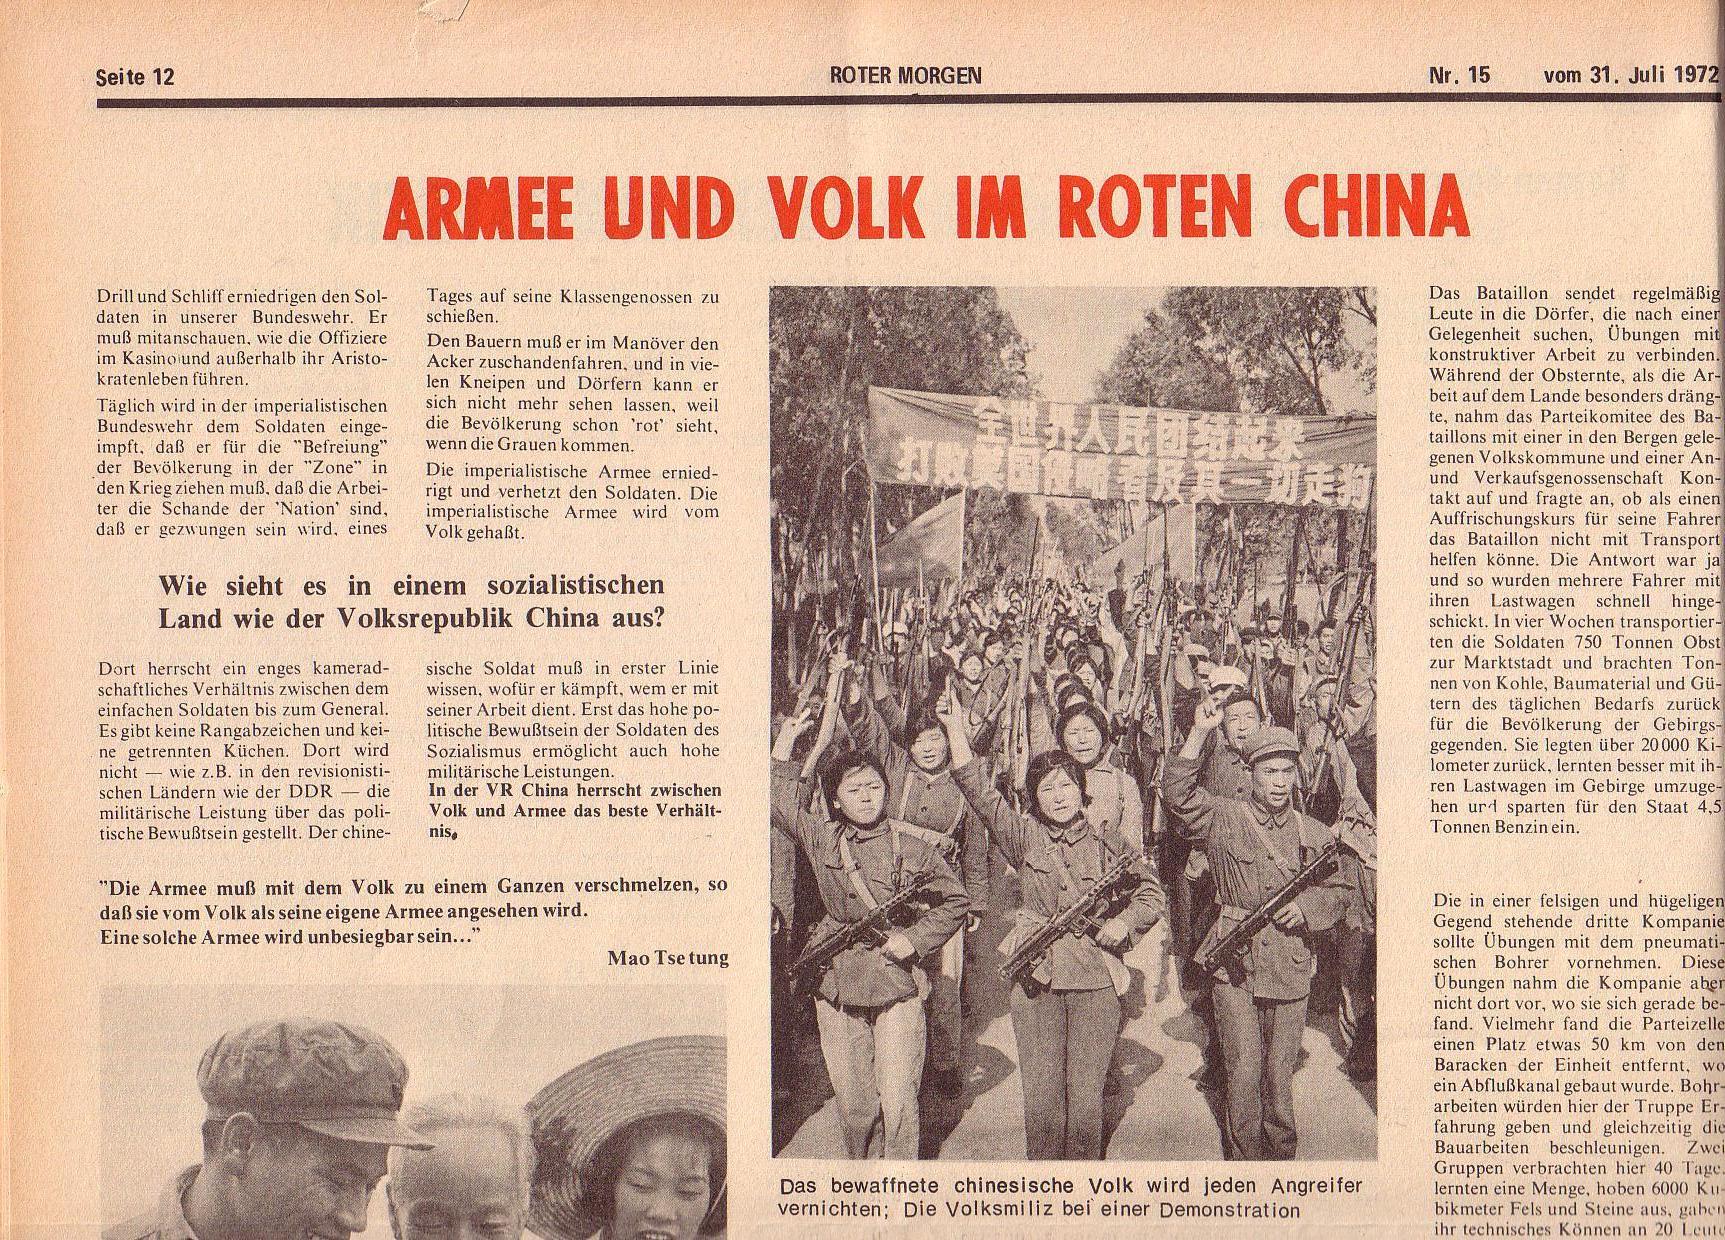 Roter Morgen, 6. Jg., 31. Juli 1972, Nr. 15, Seite 12a